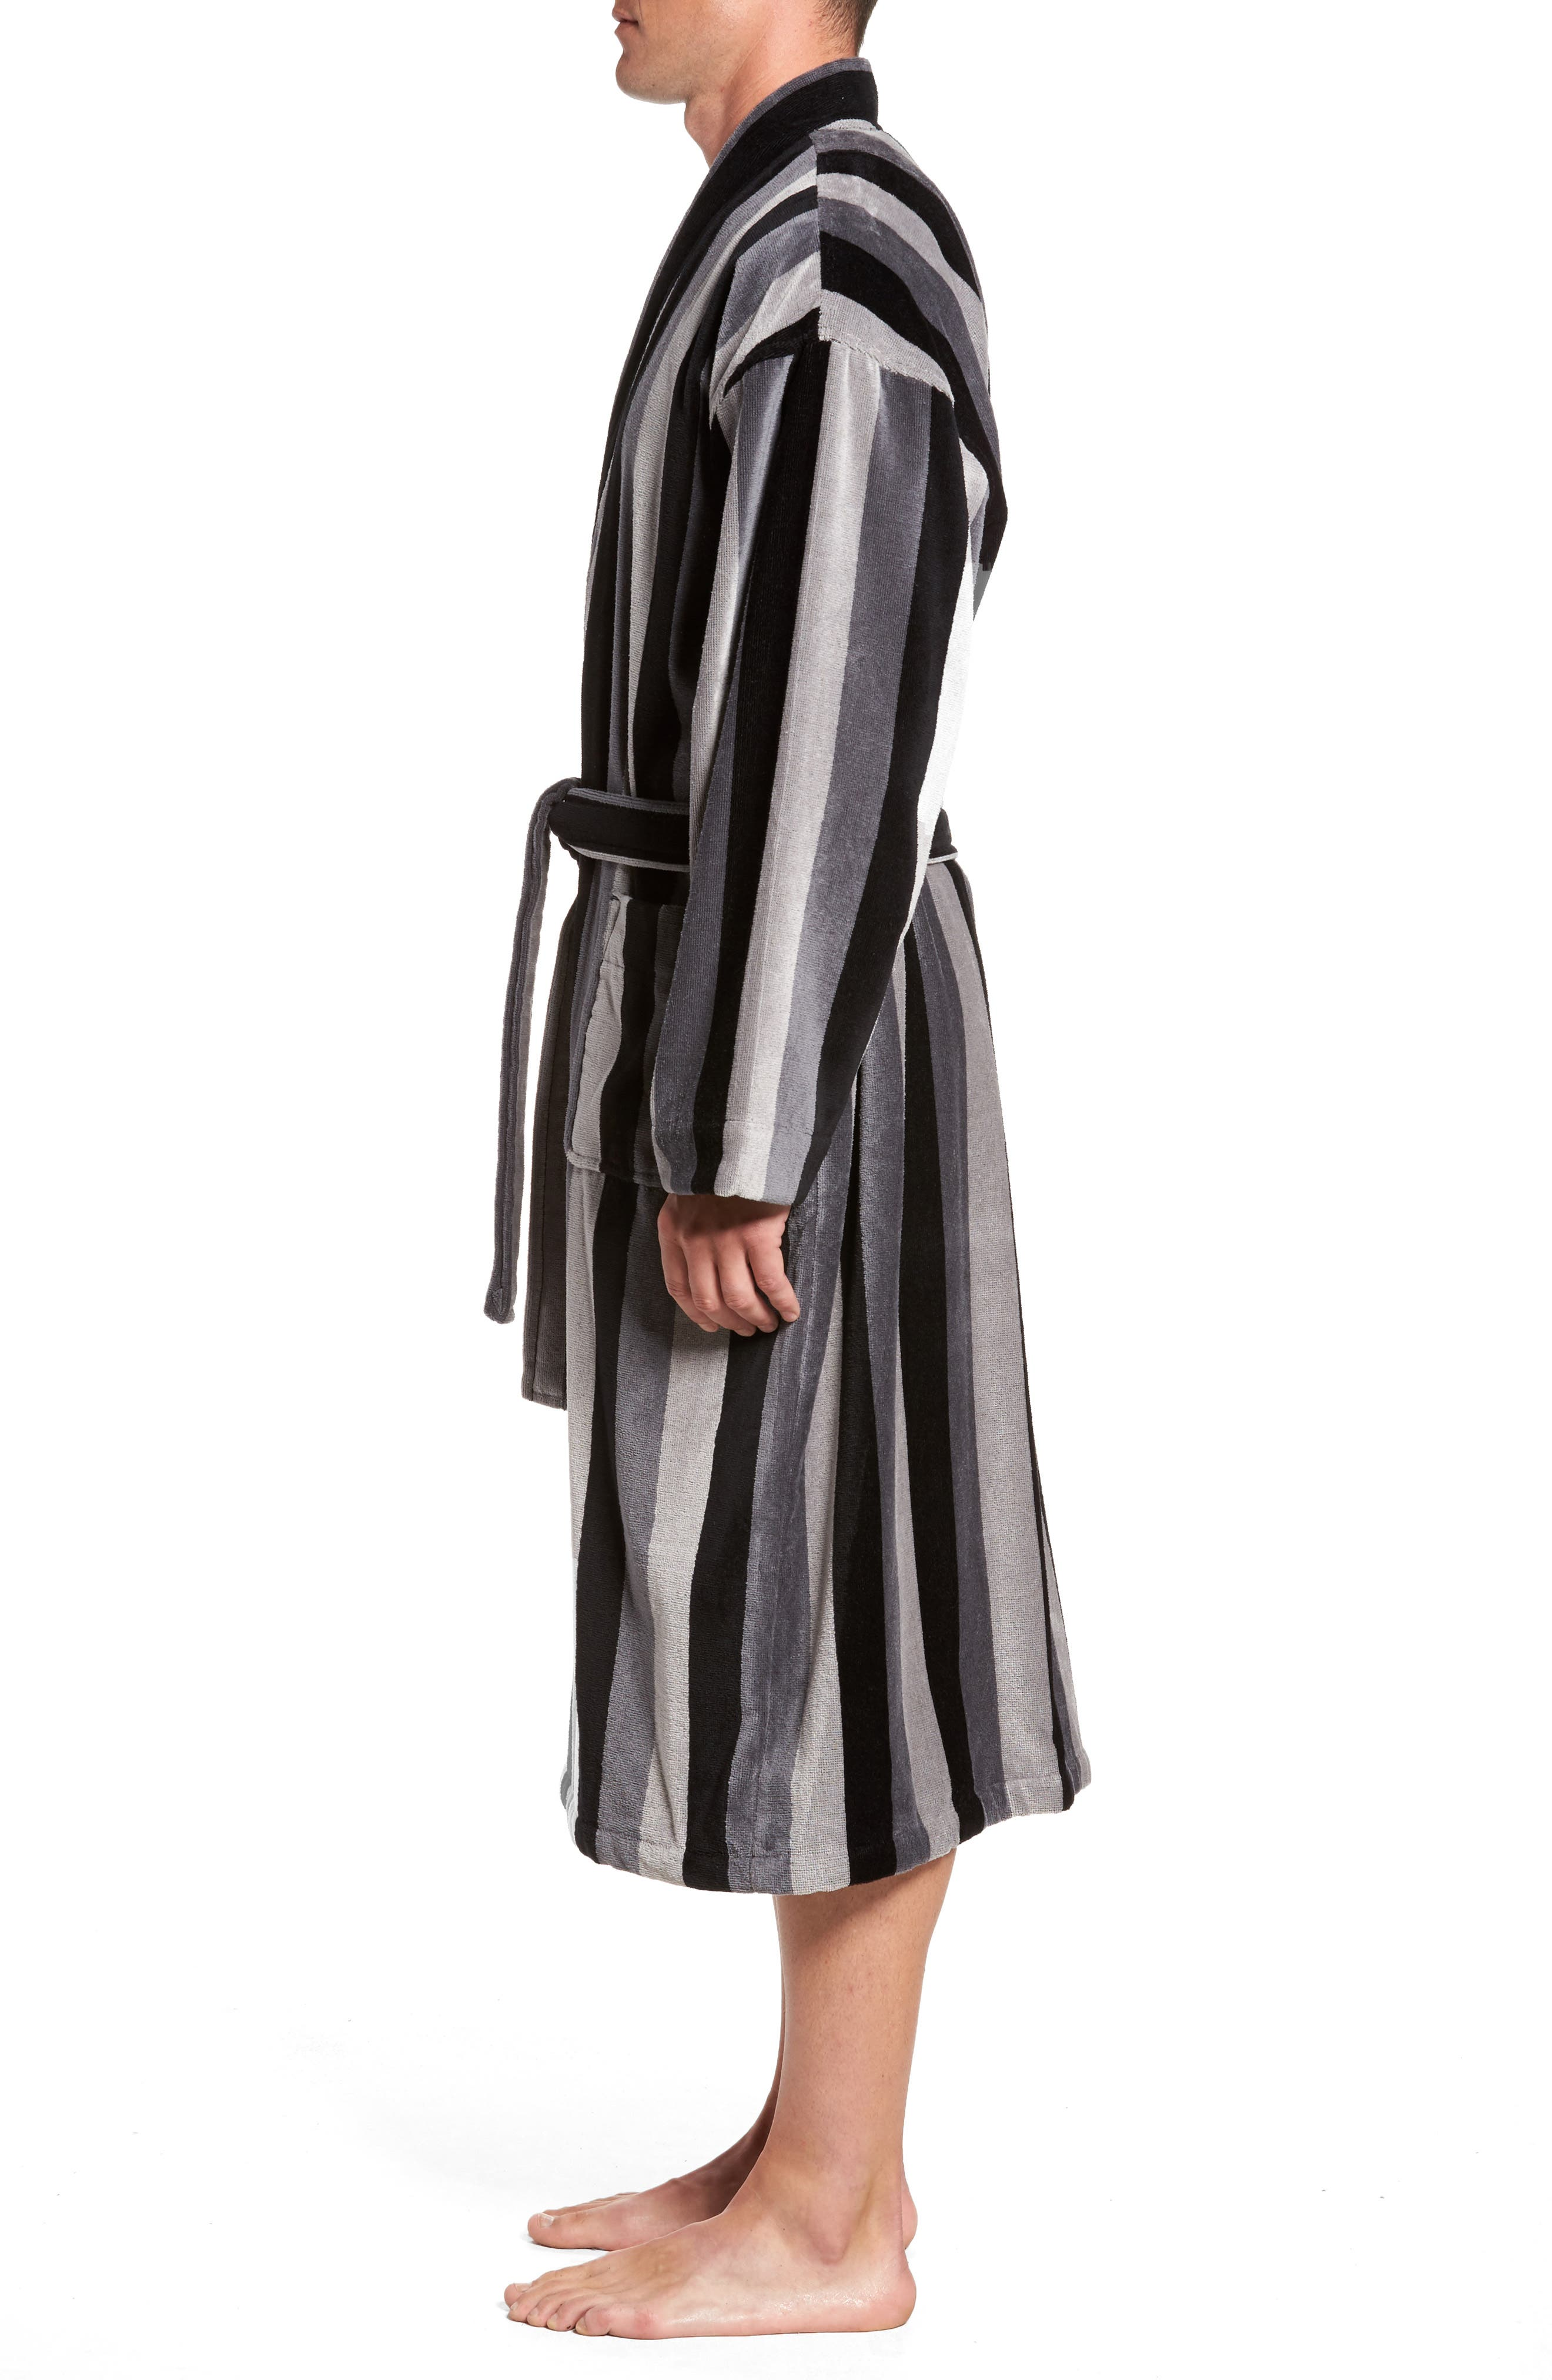 Remarkavelour Robe,                             Alternate thumbnail 3, color,                             001